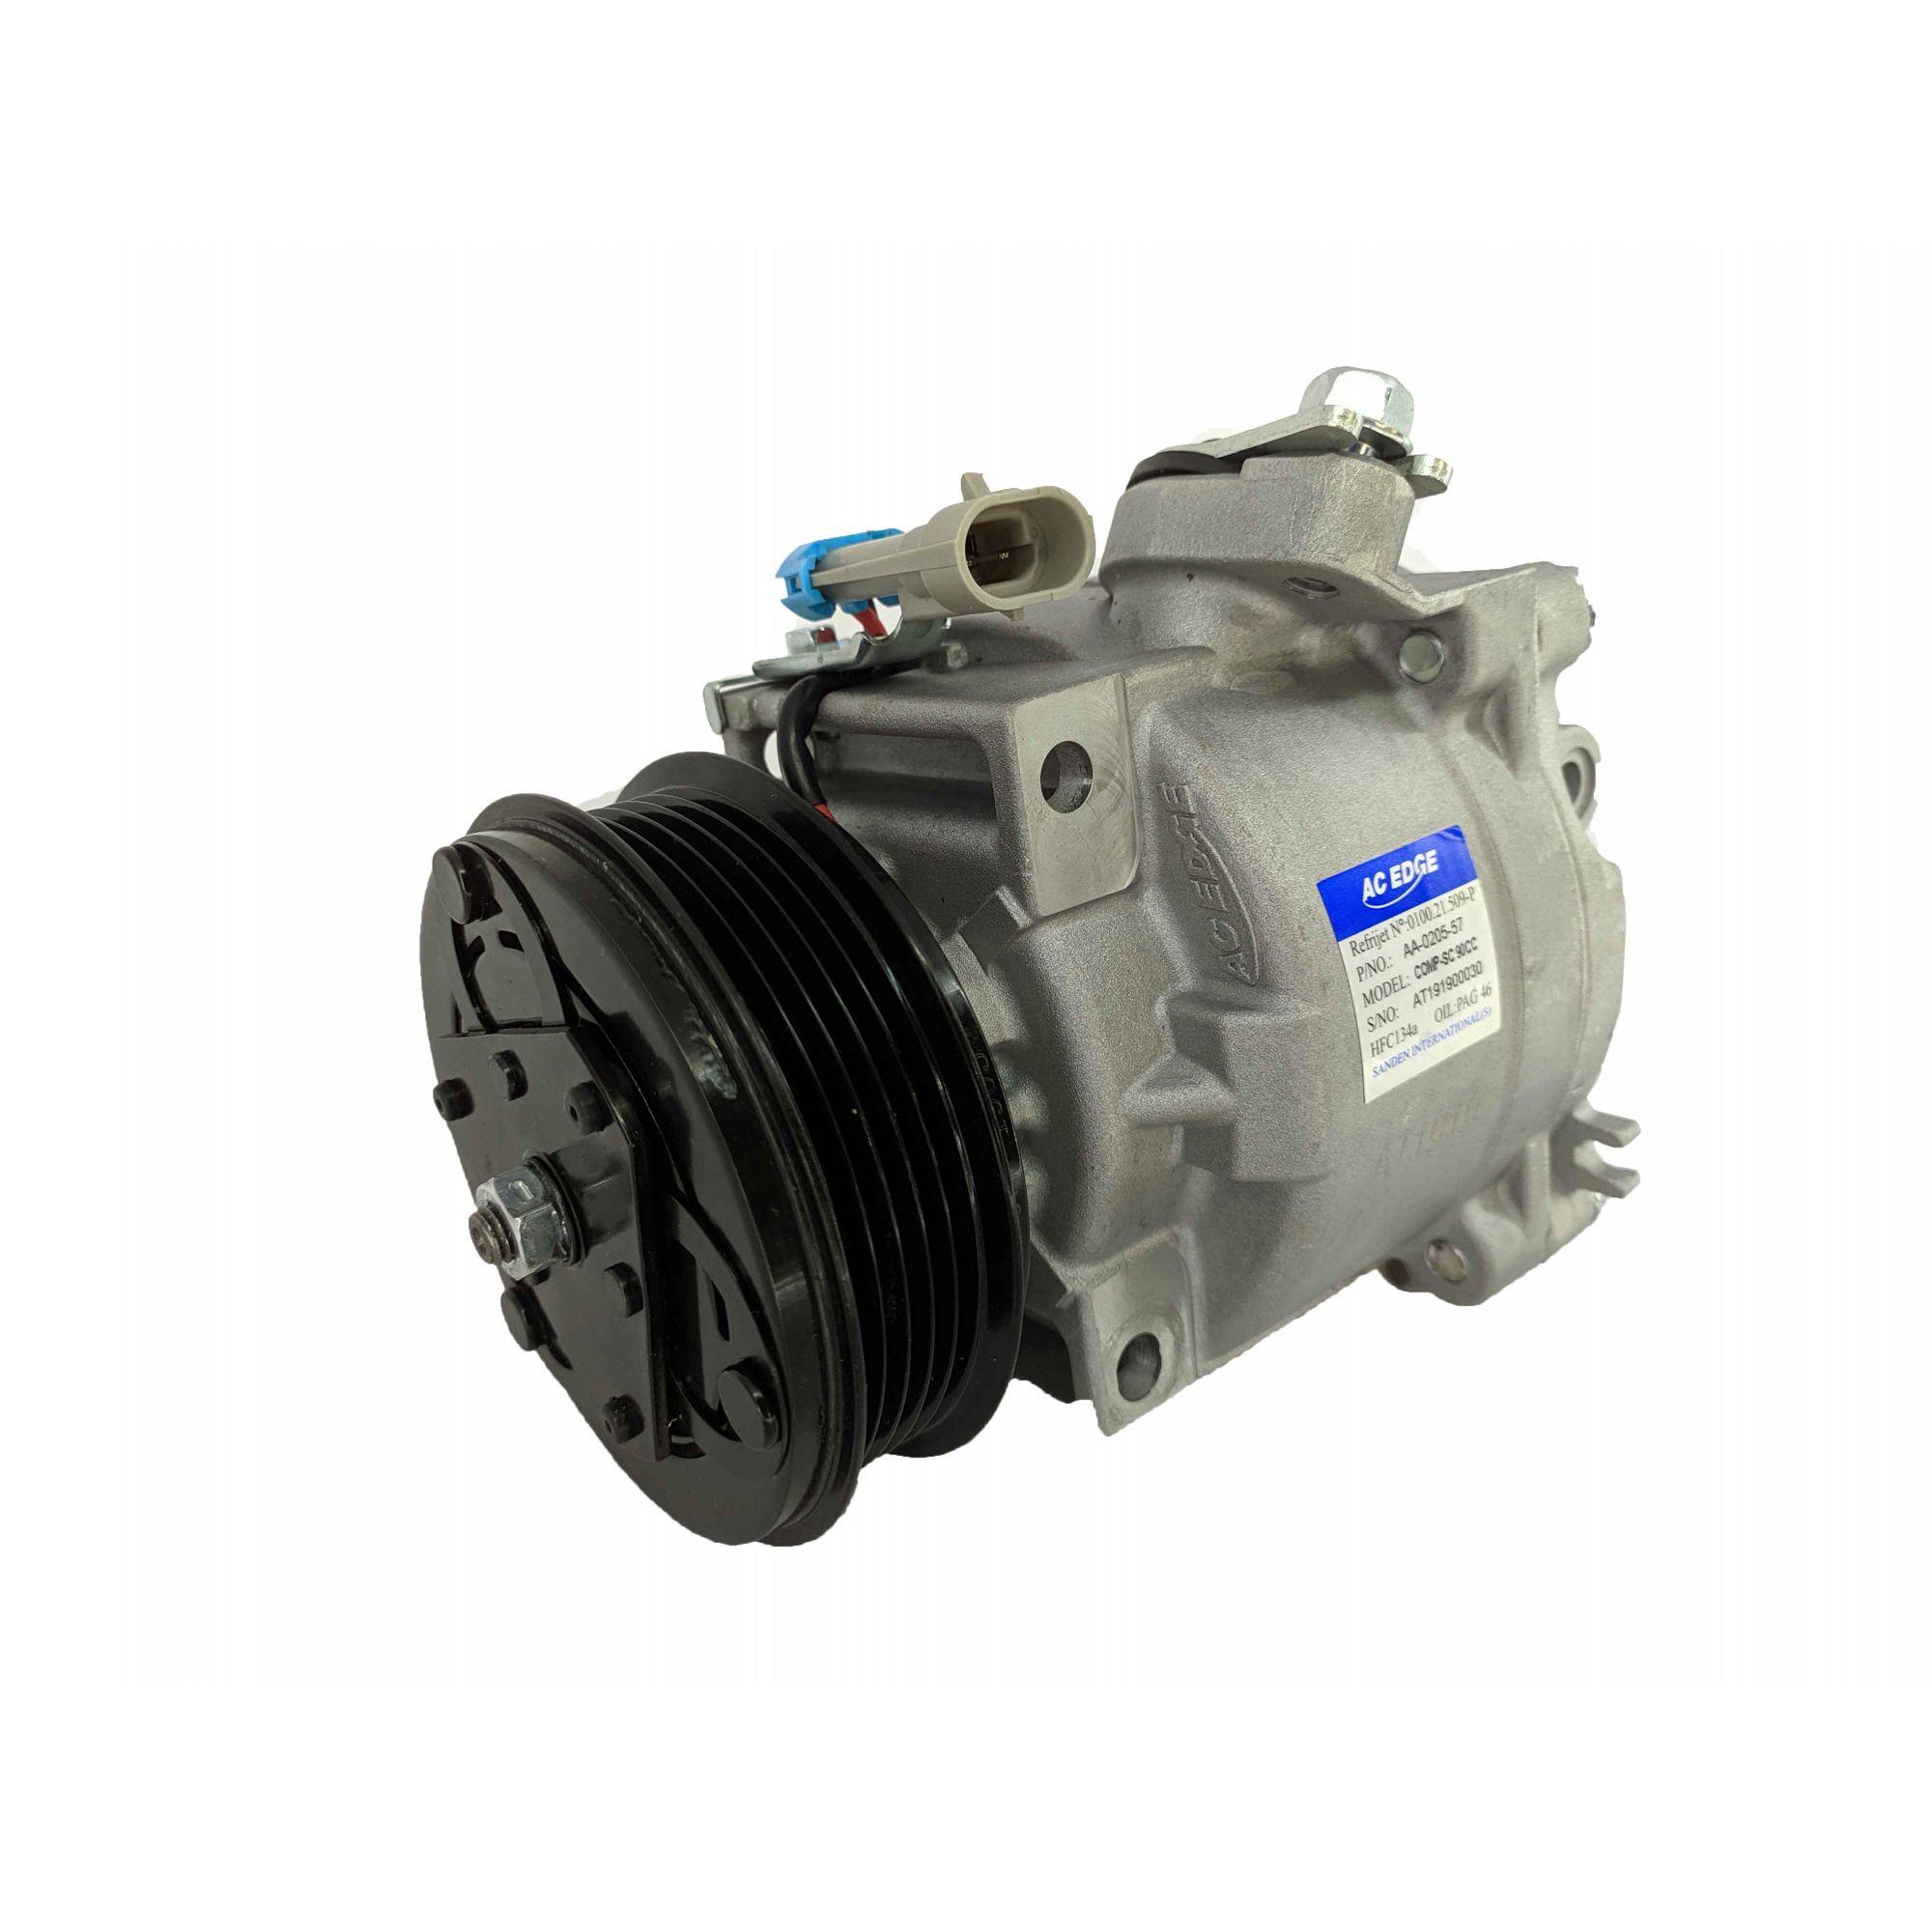 Compressor Onix / Spin 1.8 / Sonic LTZ 1.8 / Cobalt - SANDEN